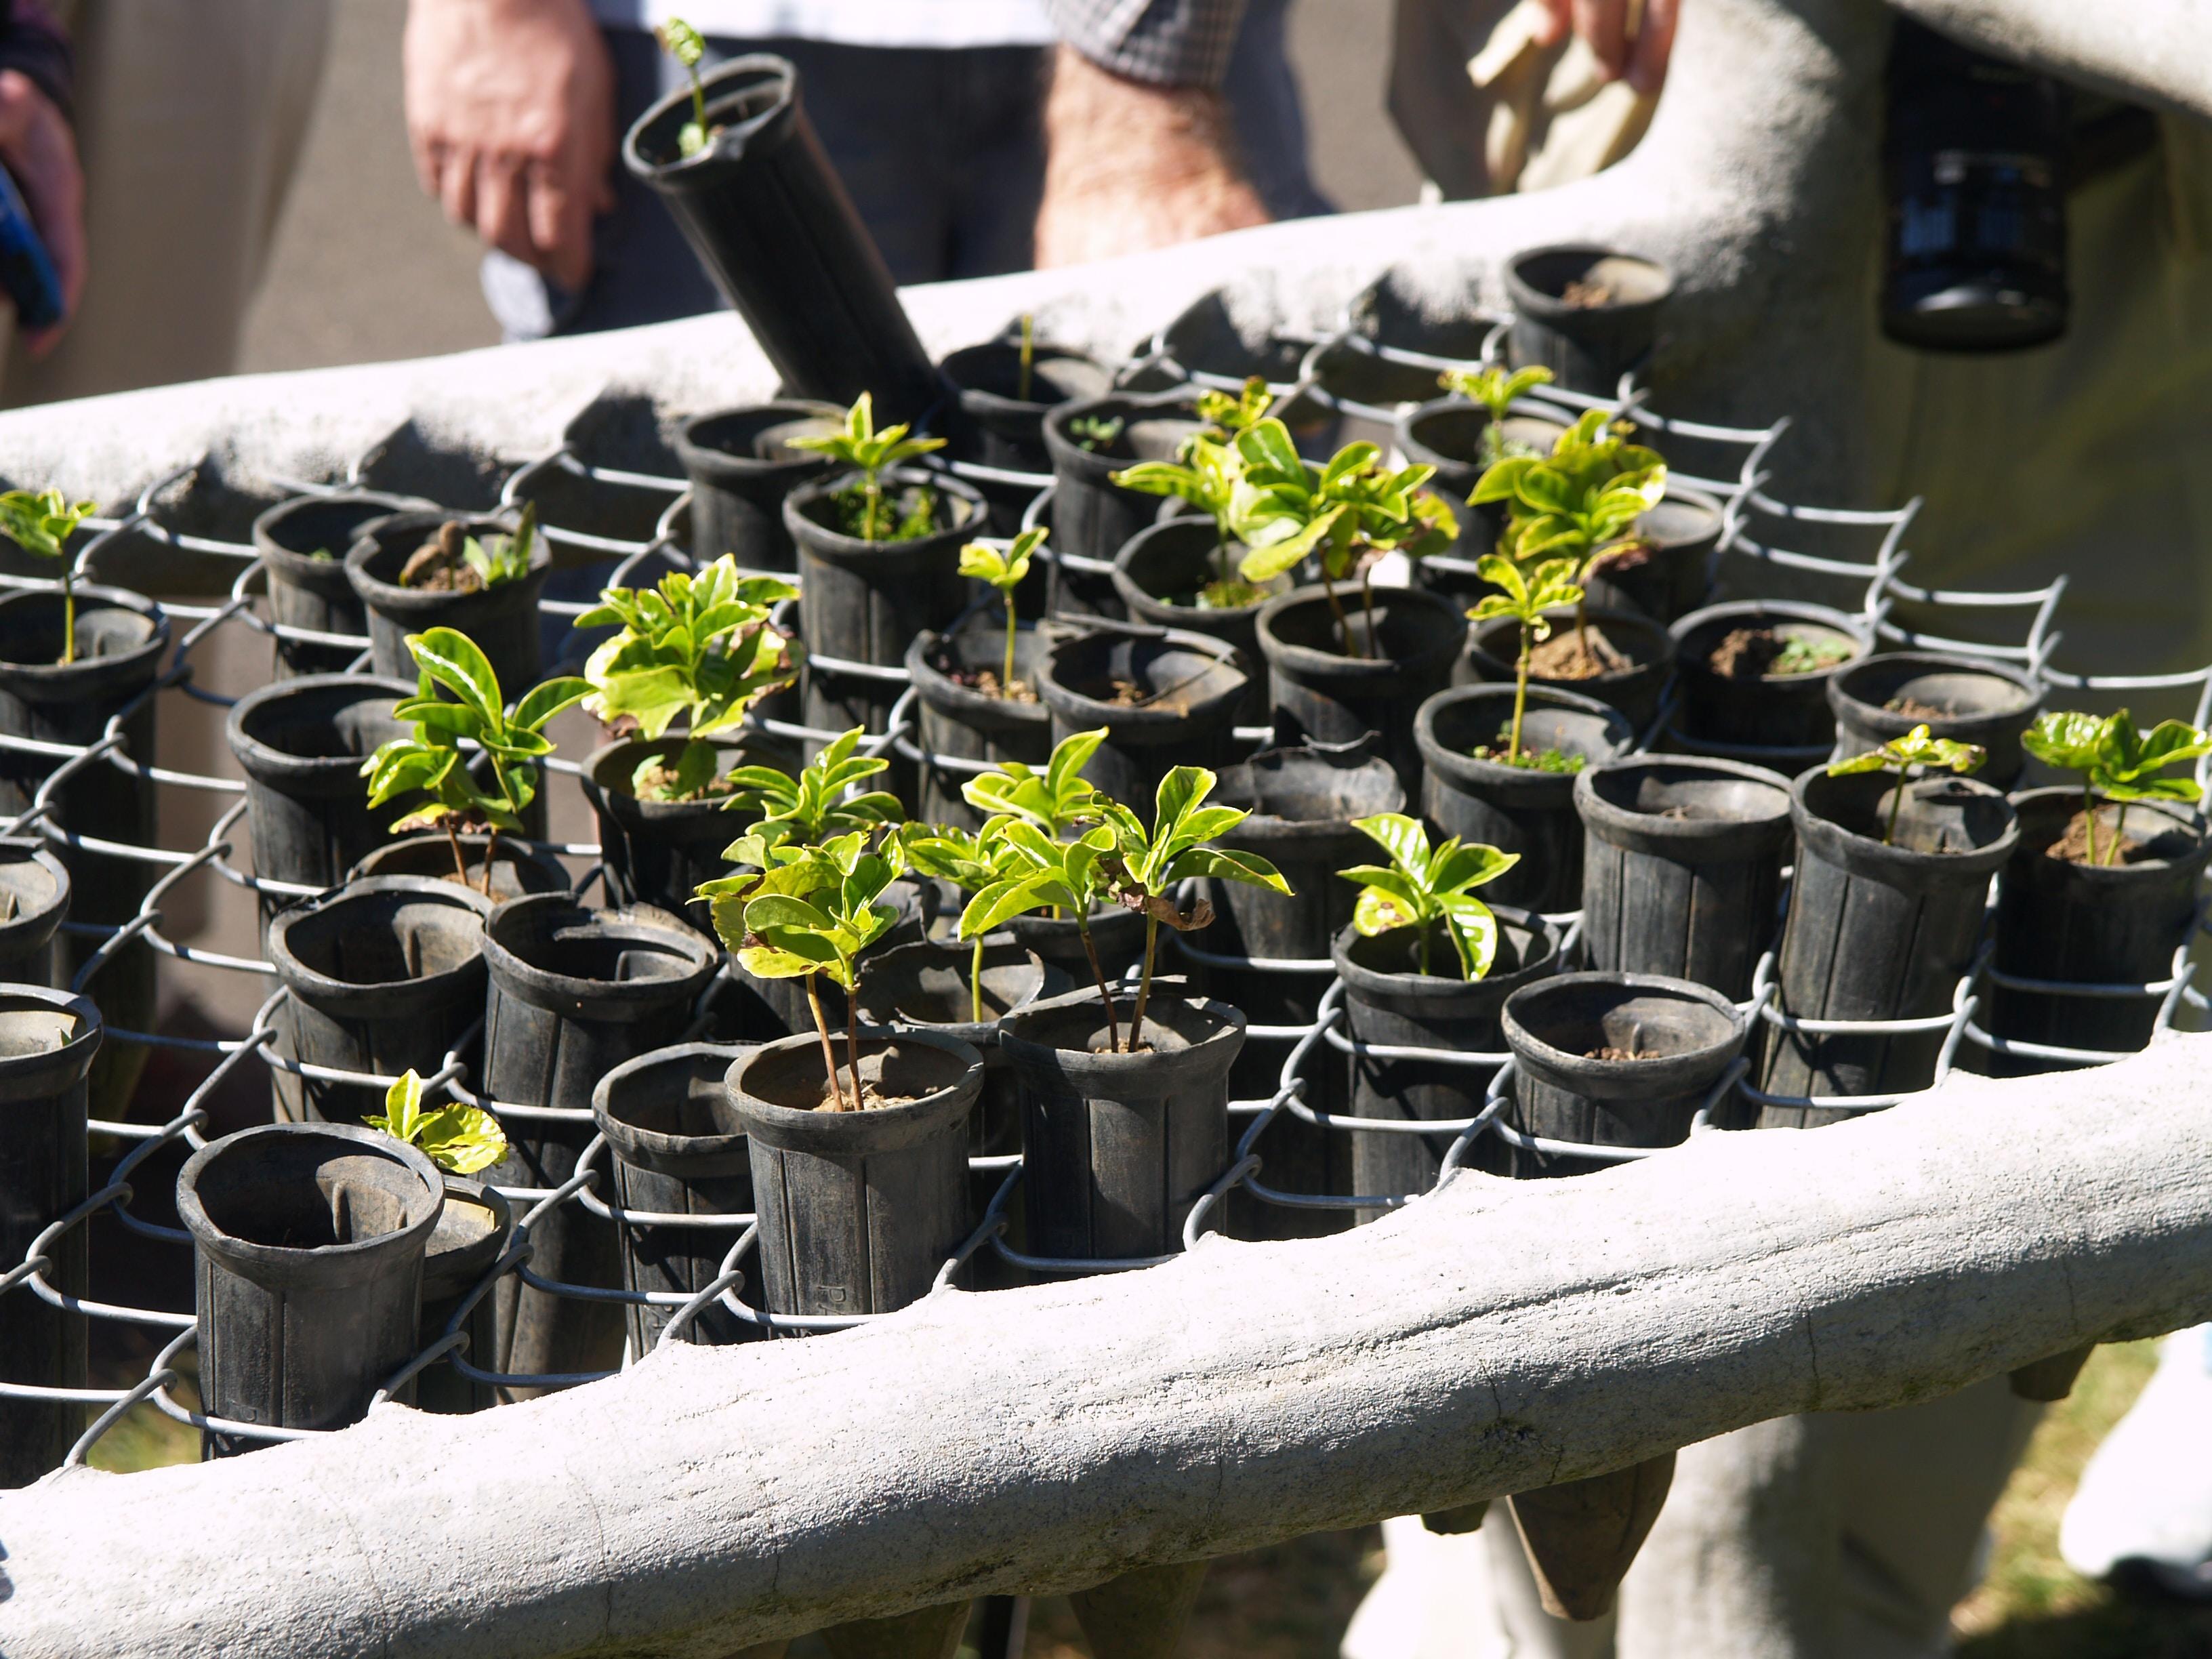 green leafed plant on black pots